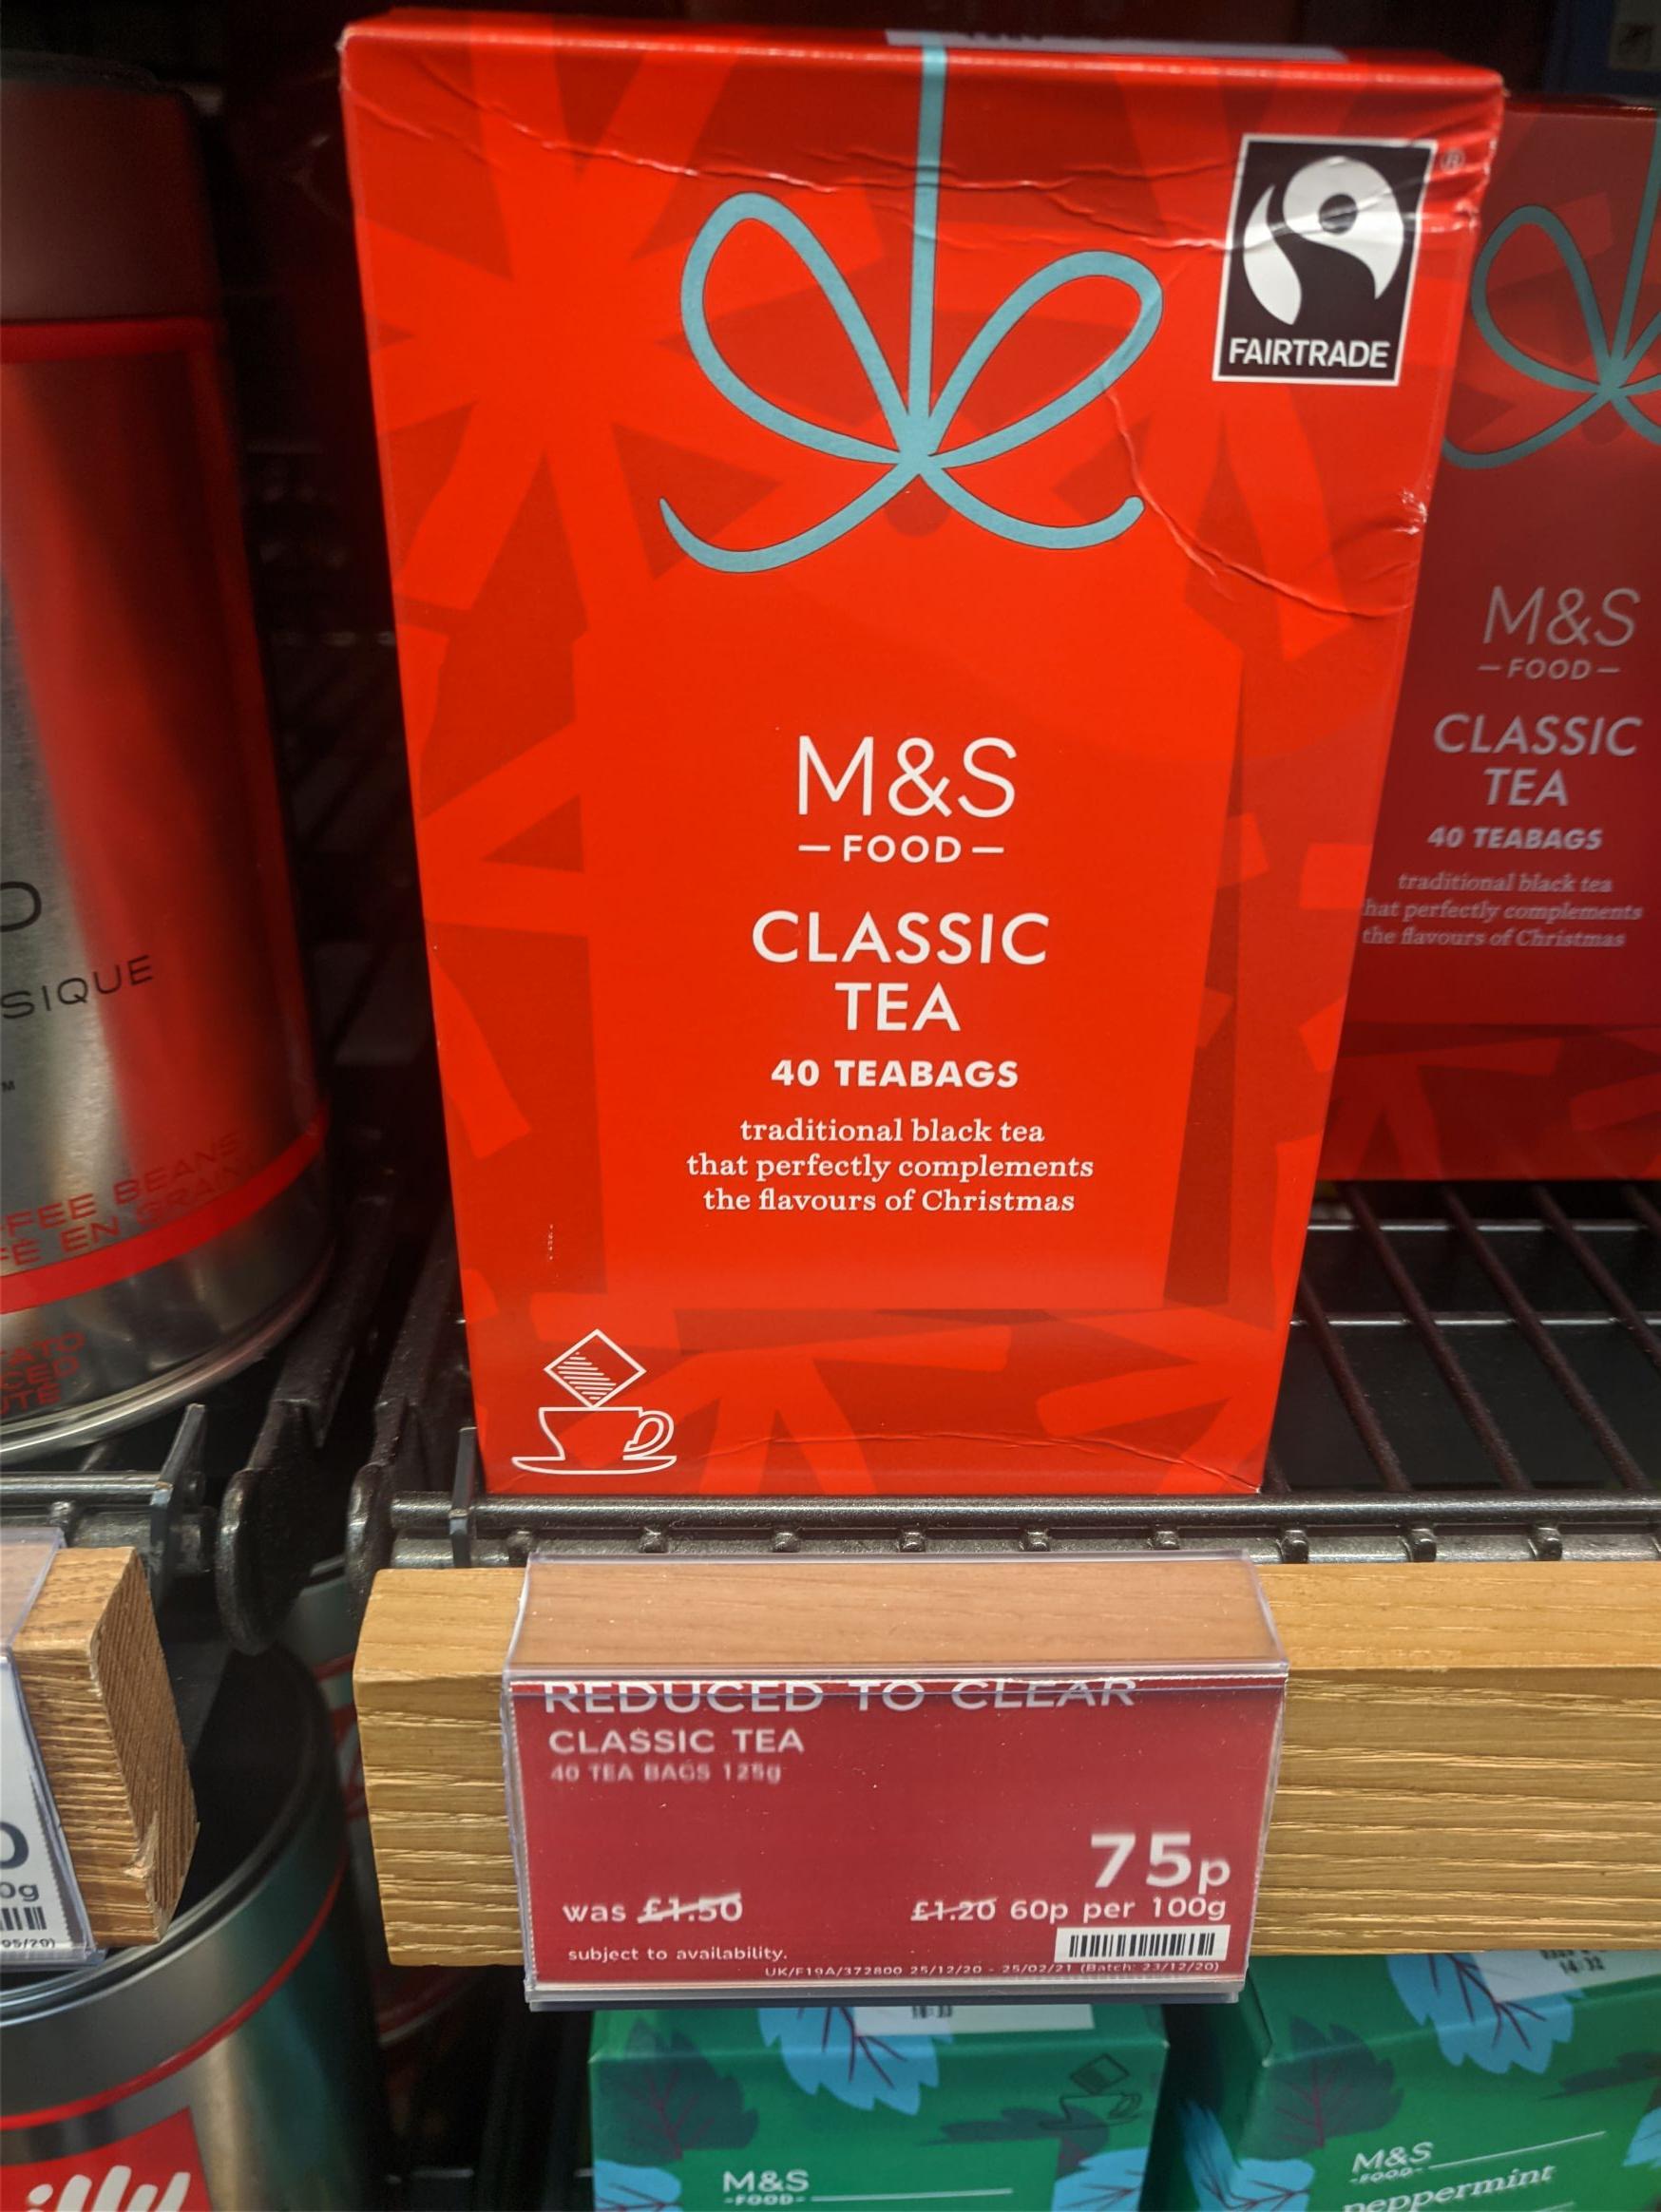 M&S - Classic Tea (40 bags) - 75p @ Marks & Spencer (Canterbury)